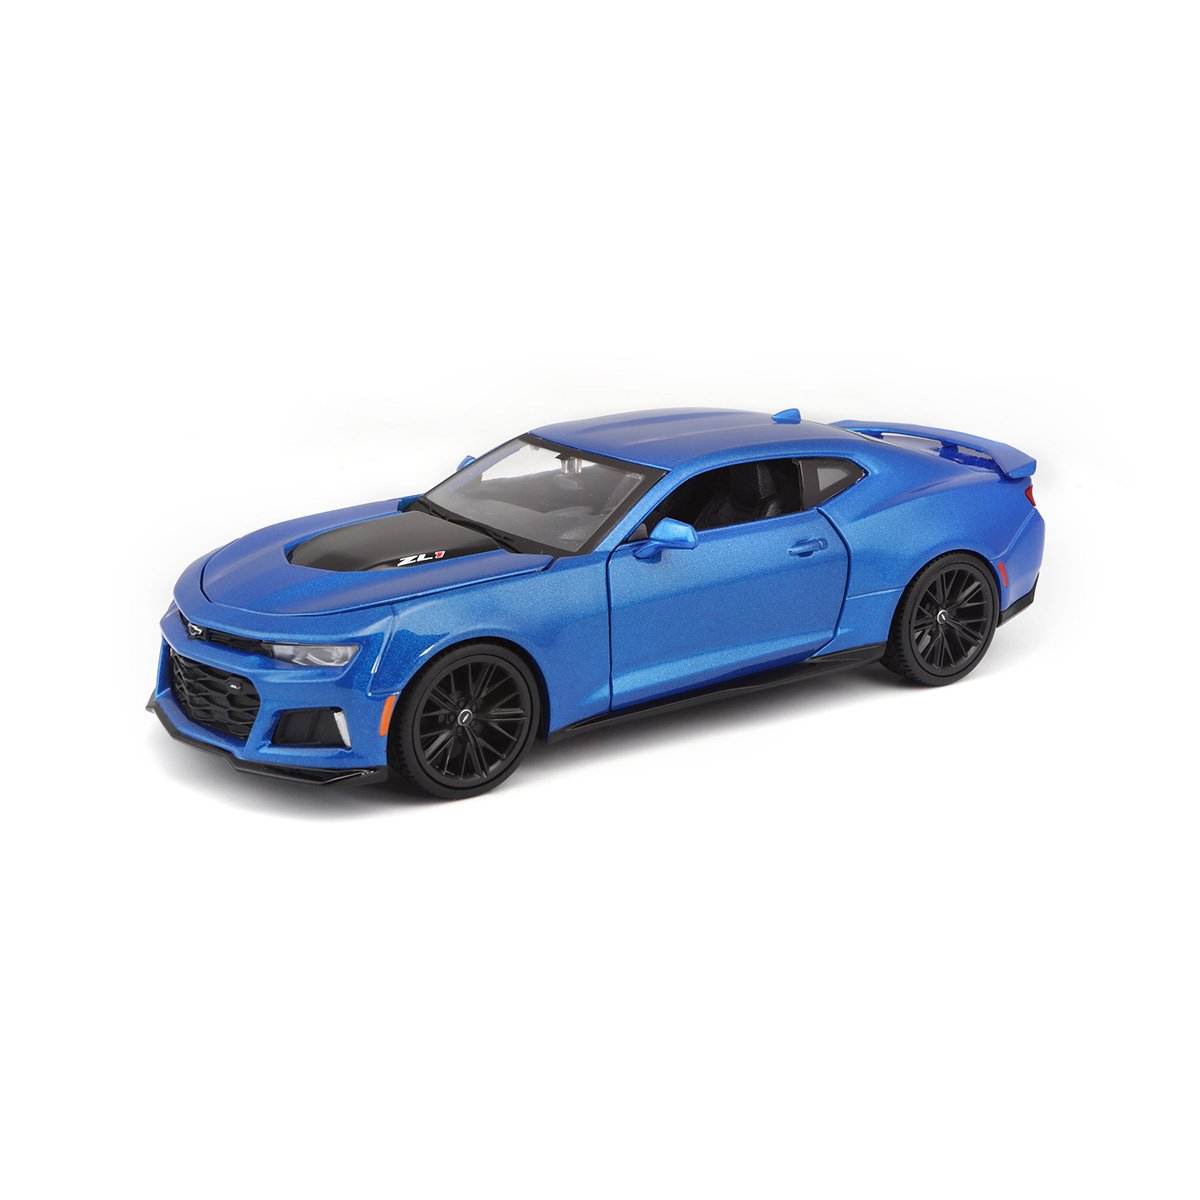 Masinuta Maisto Chevrolet Camaro Zl1 2017, 1:24, Albastru